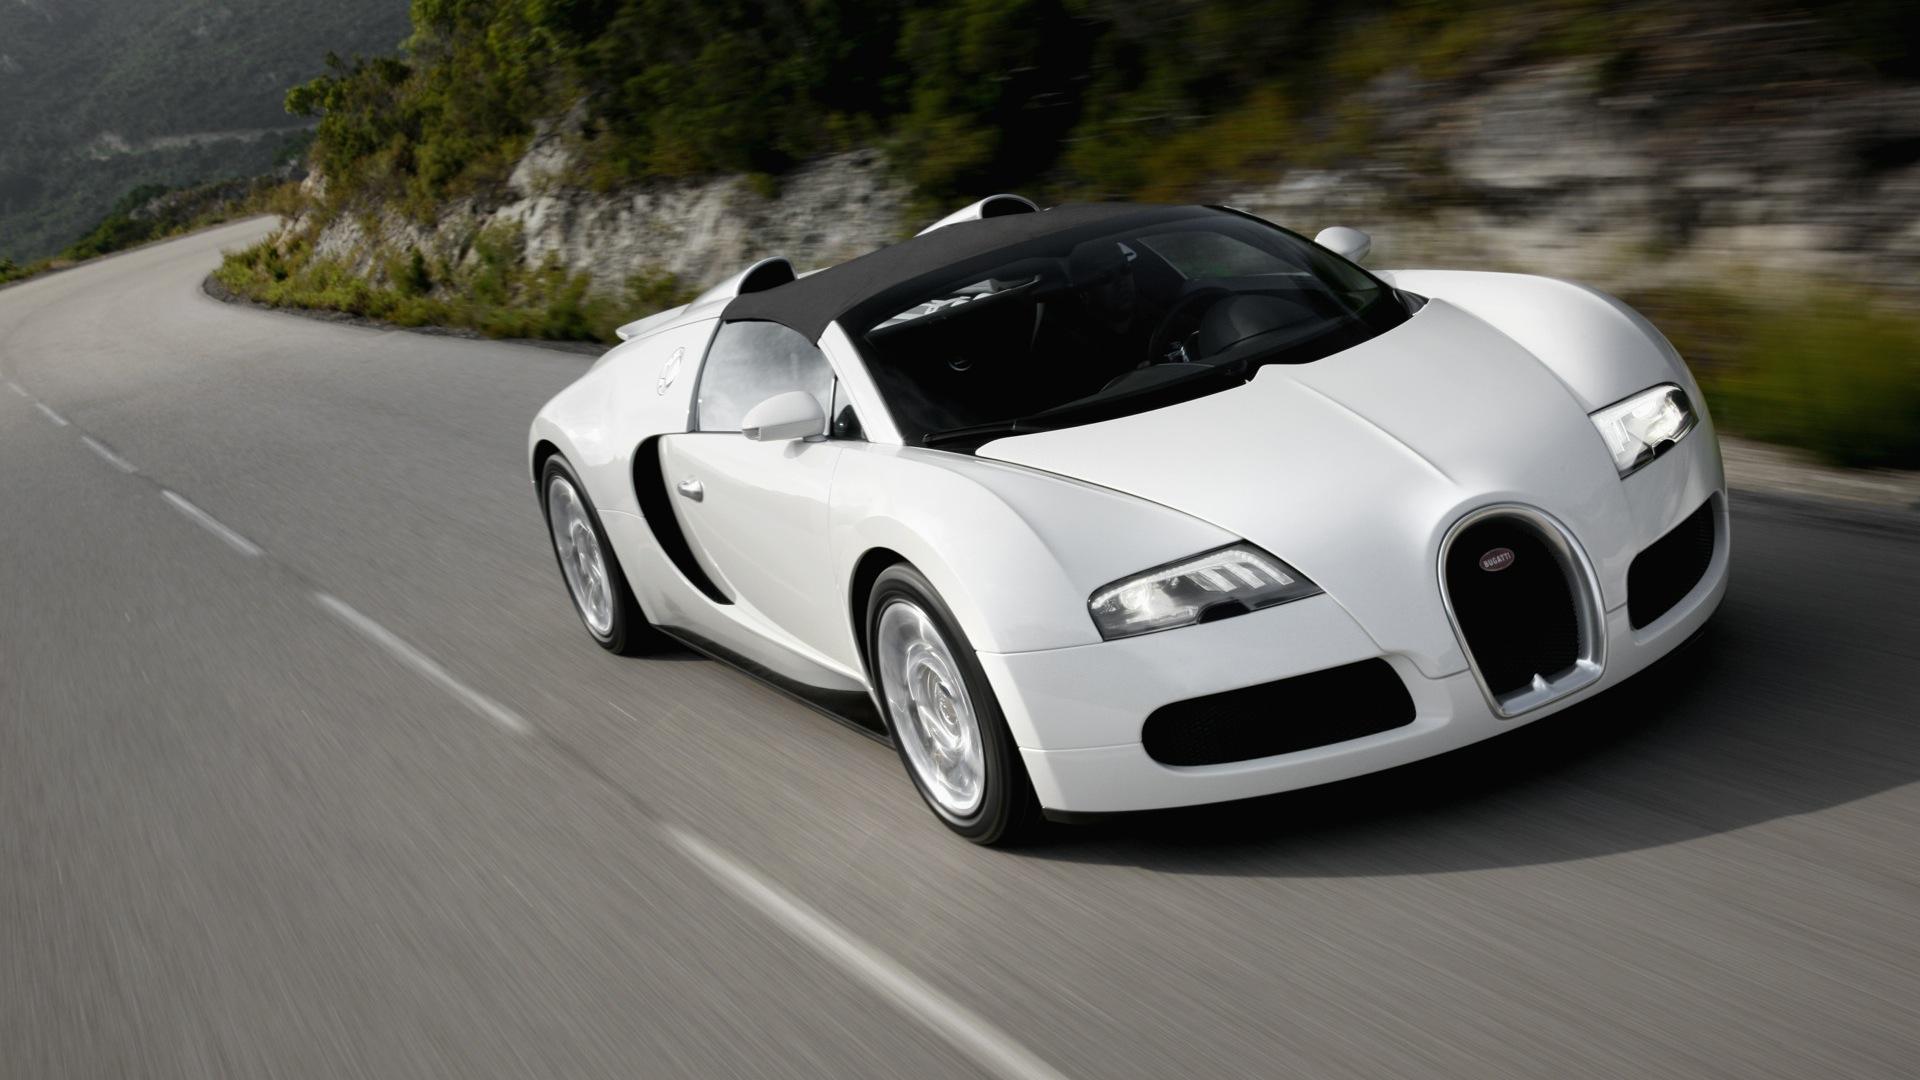 8842_3 Wonderful Bugatti Veyron On Road Price Cars Trend